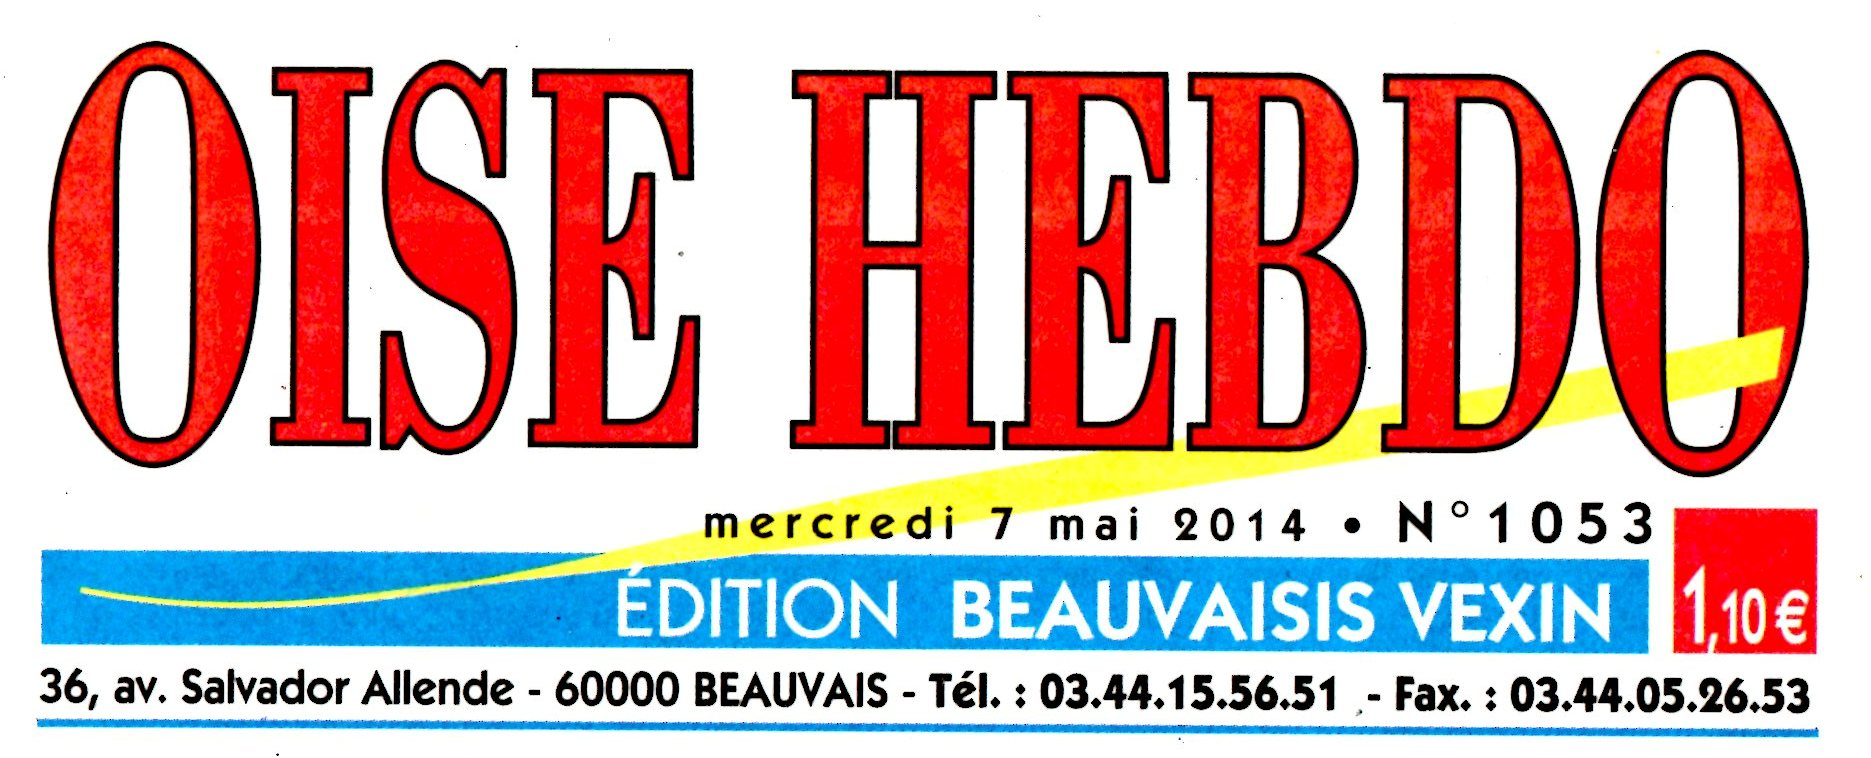 L'OISE HEBDO BETTY 7 MAI 2014